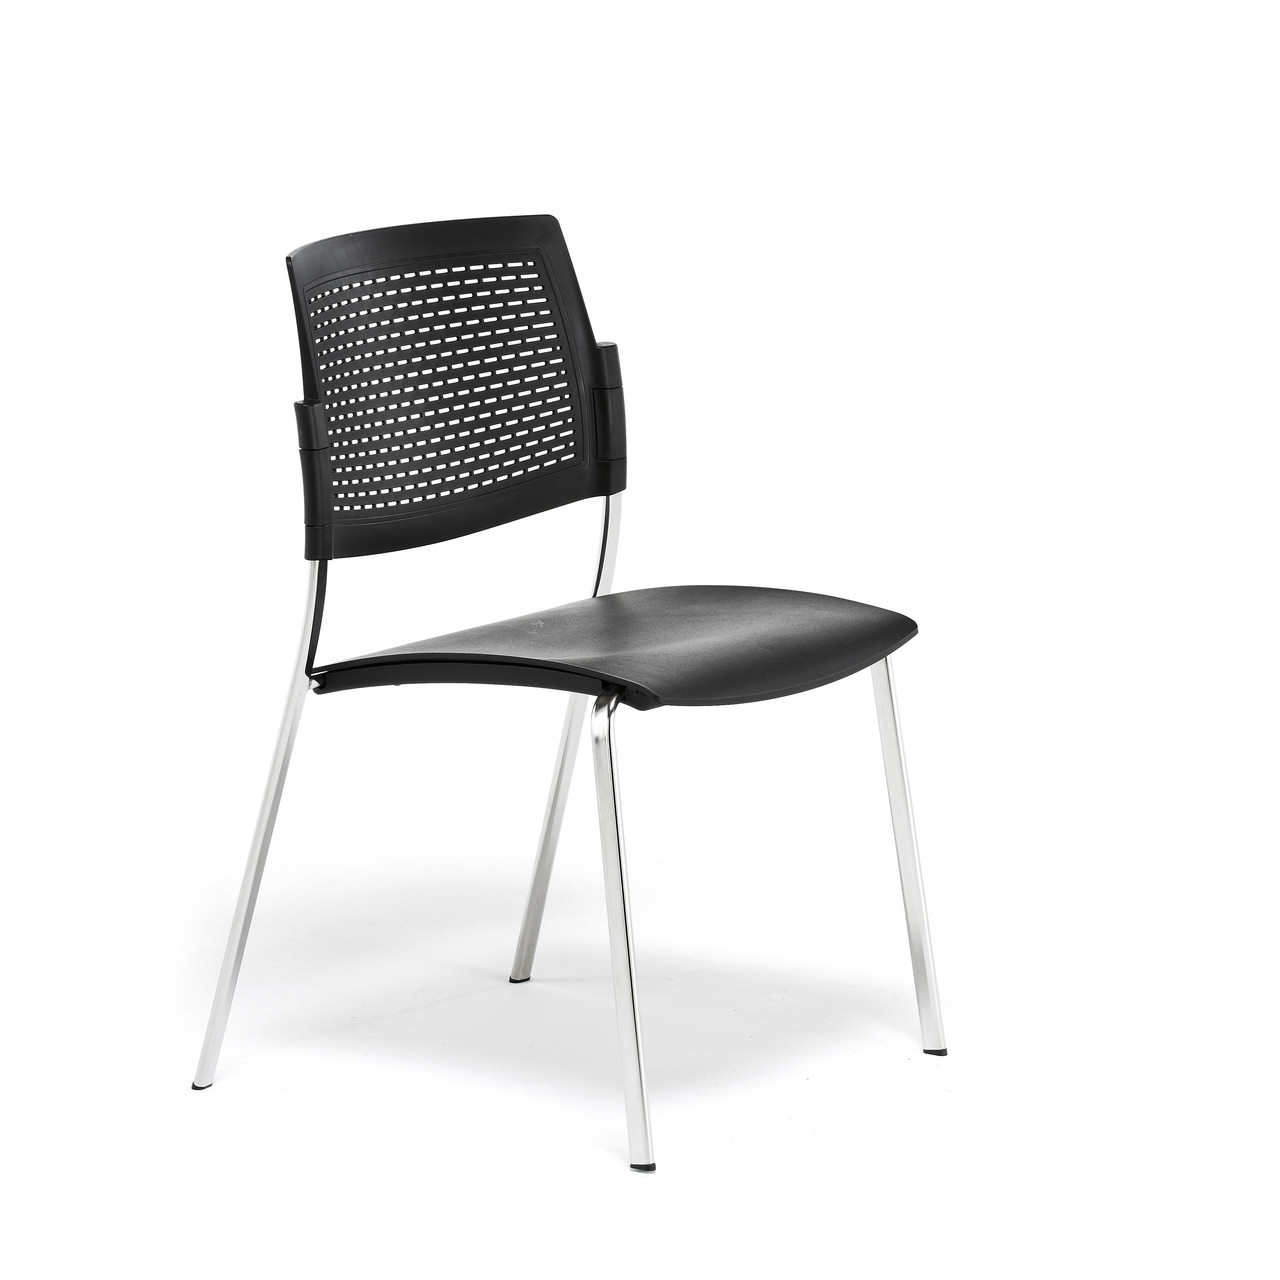 Satsu 4-Leg - Meeting & Visitor Chairs - MSS02